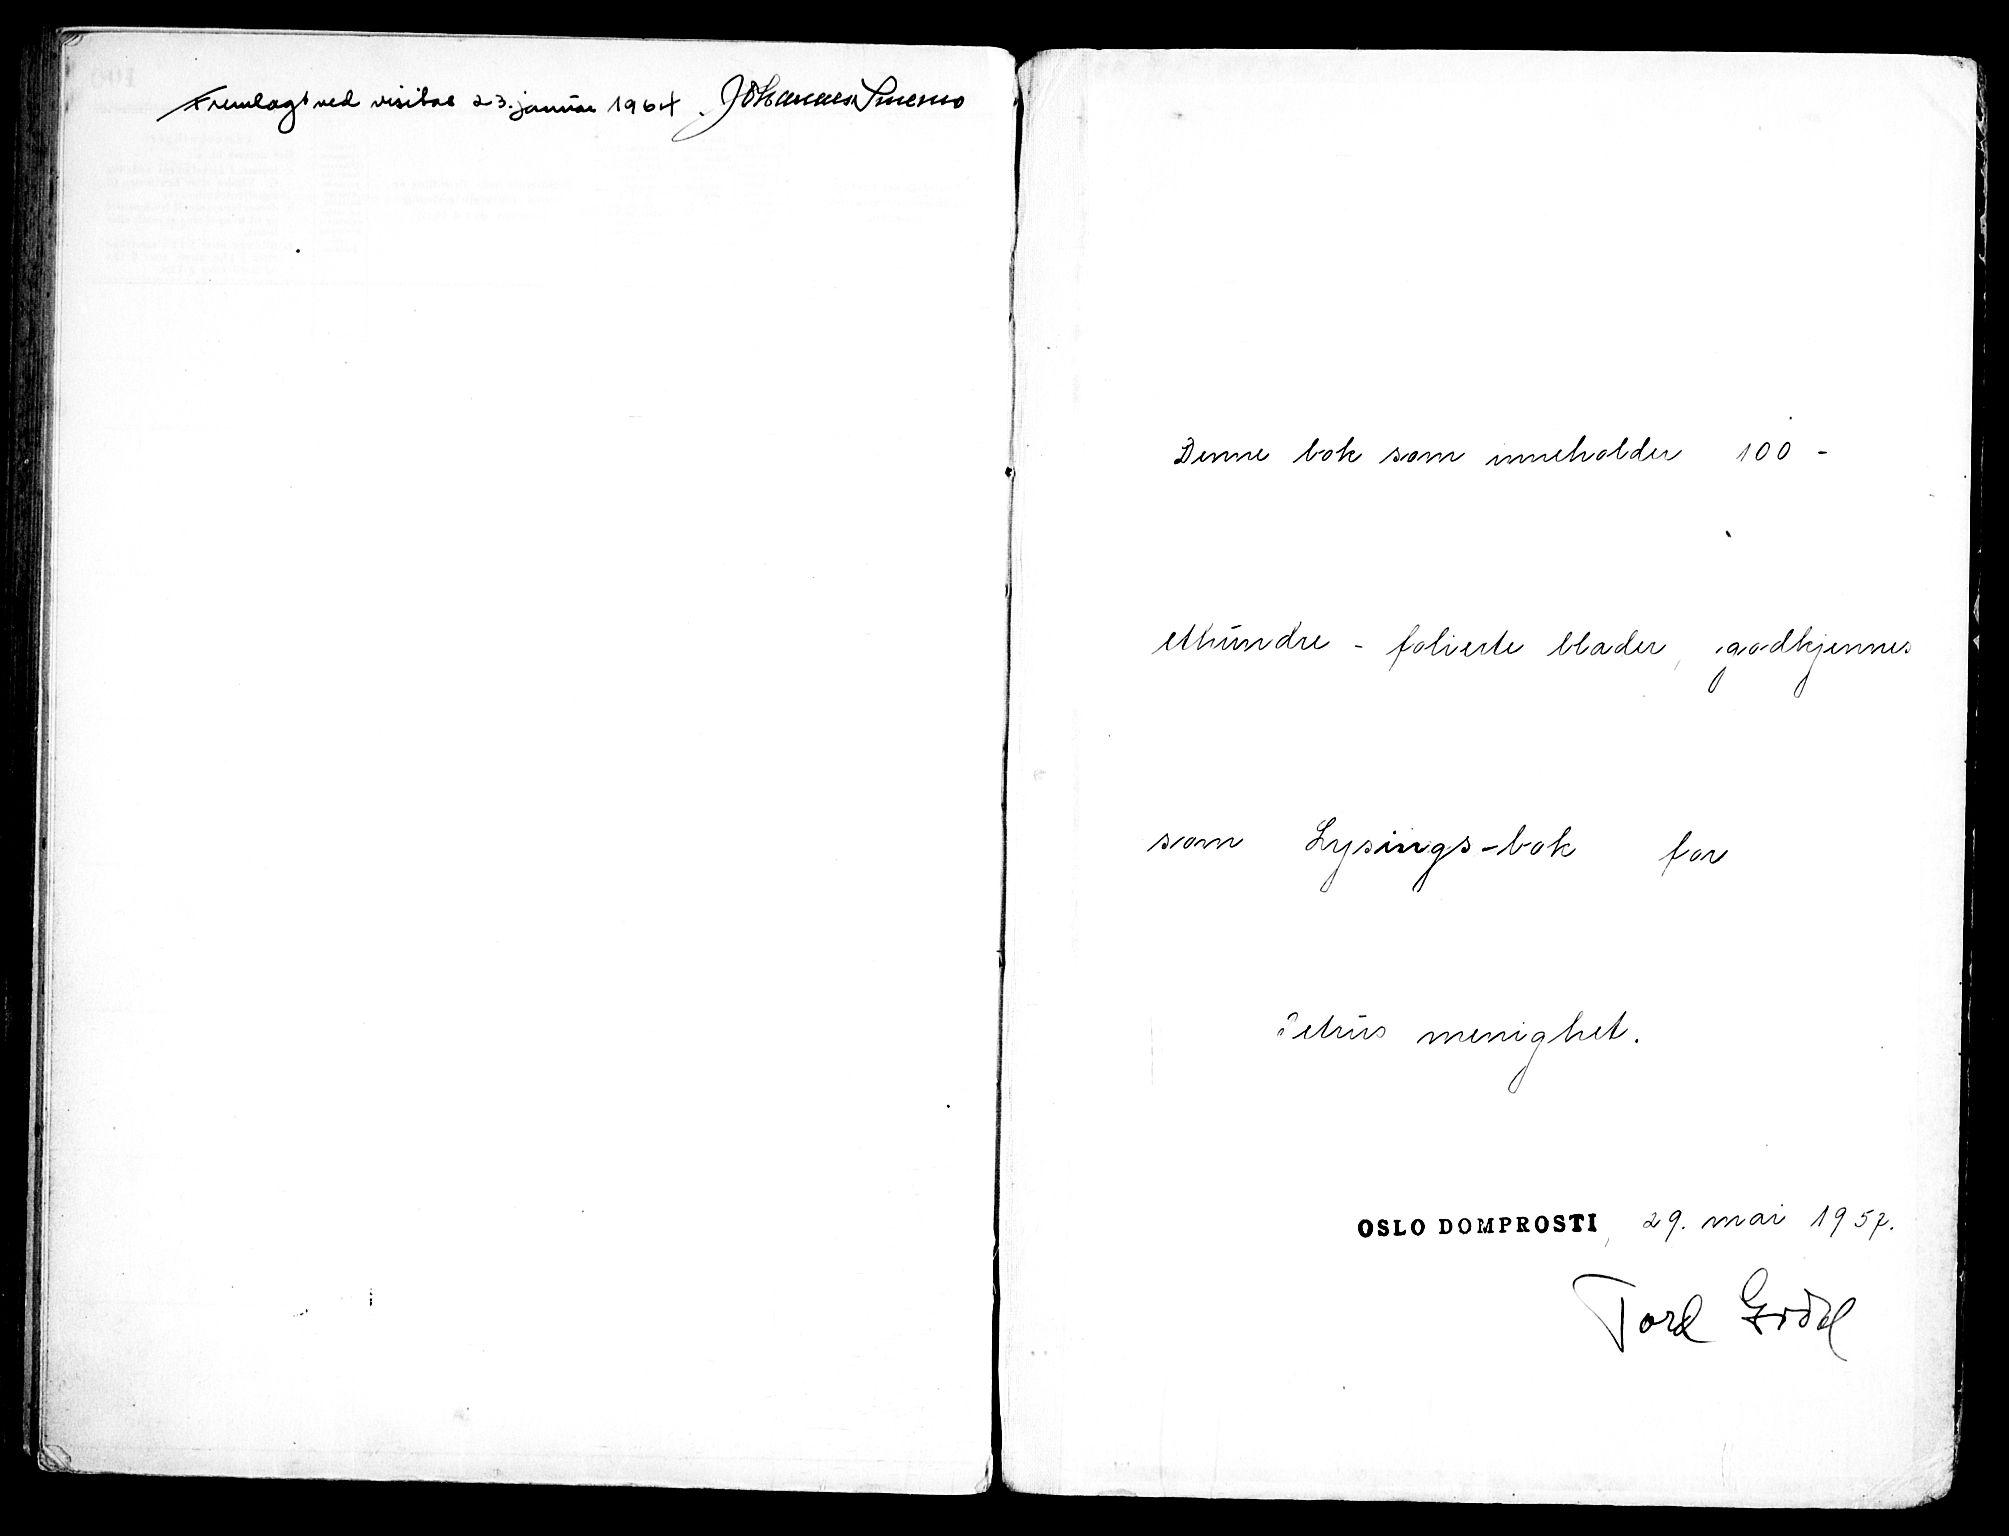 SAO, Petrus prestekontor Kirkebøker, H/Ha/L0006: Lysningsprotokoll nr. 6, 1957-1966